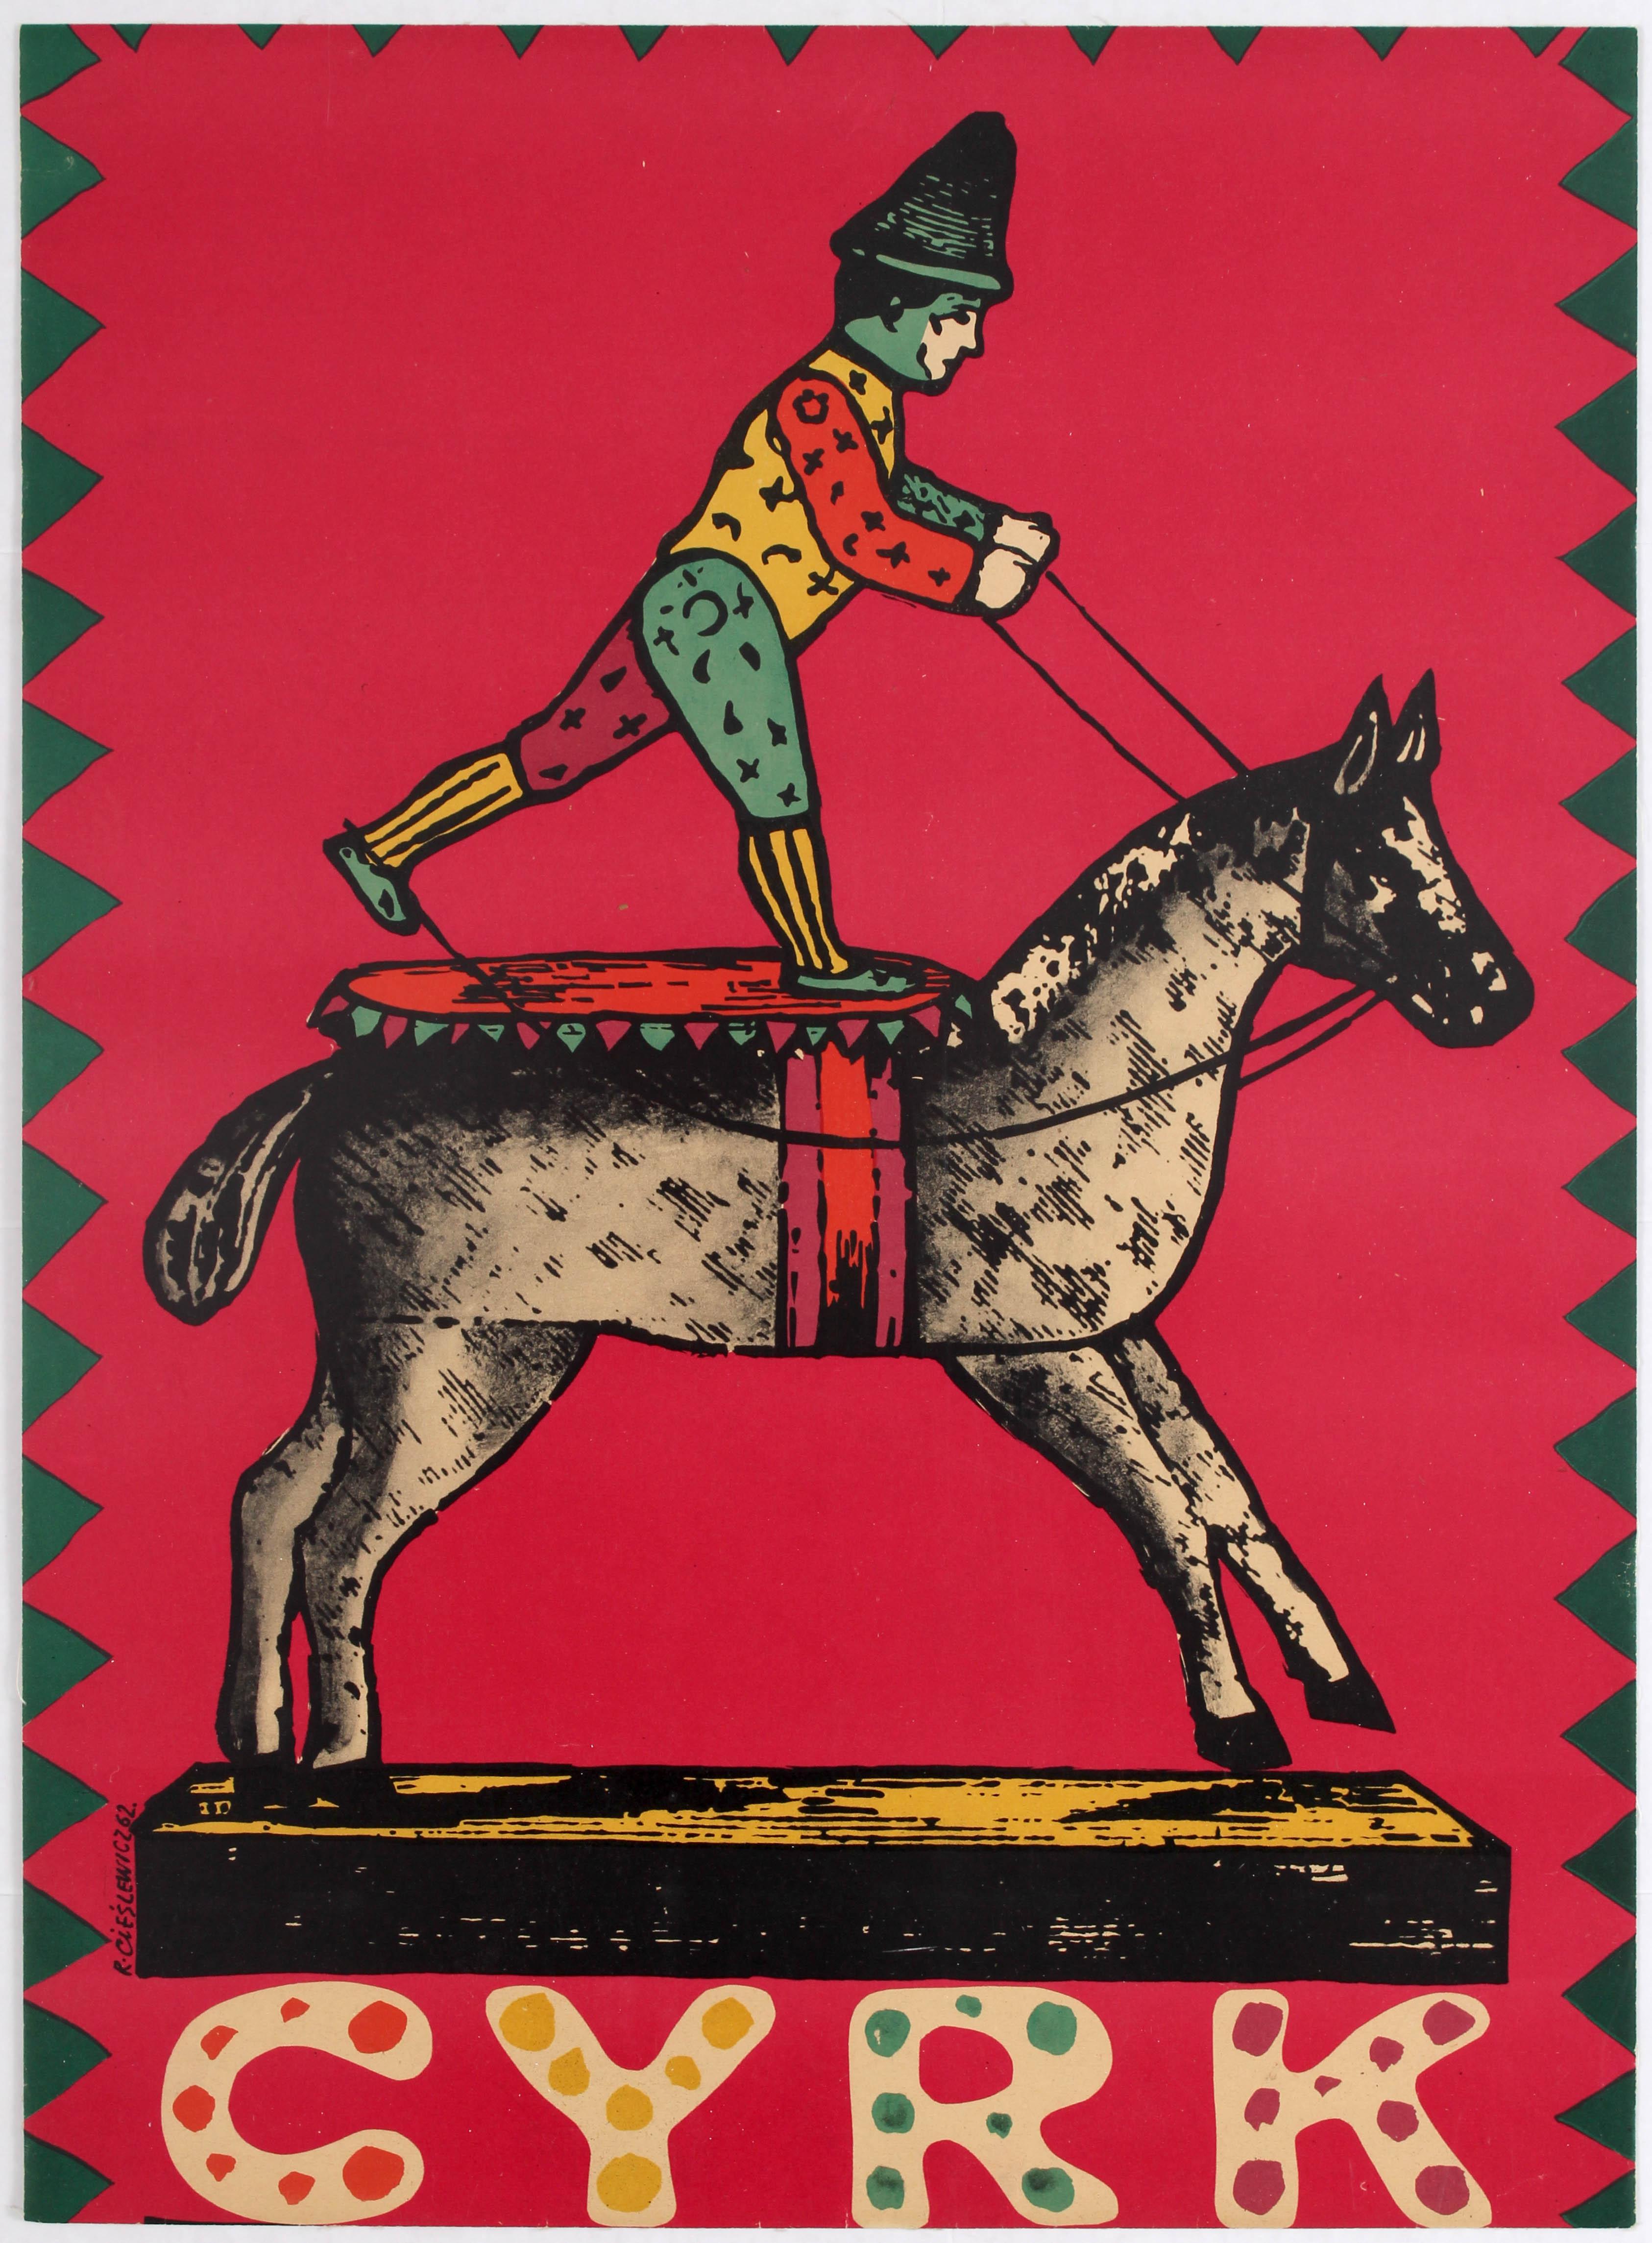 Lot 1603 - Advertising Polish Circus poster – Cyrk, wooden horse